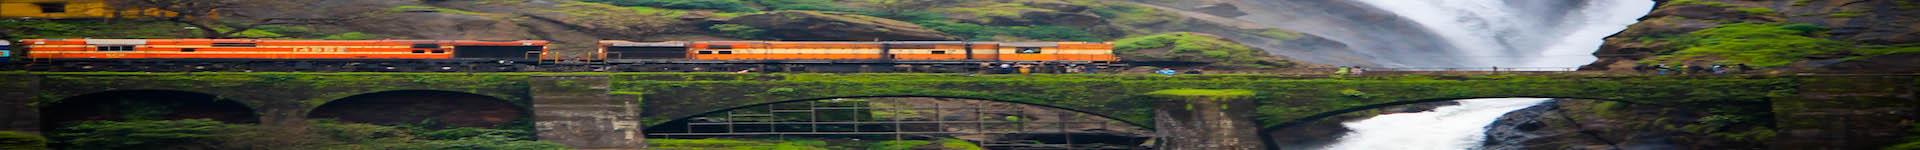 Railways in India